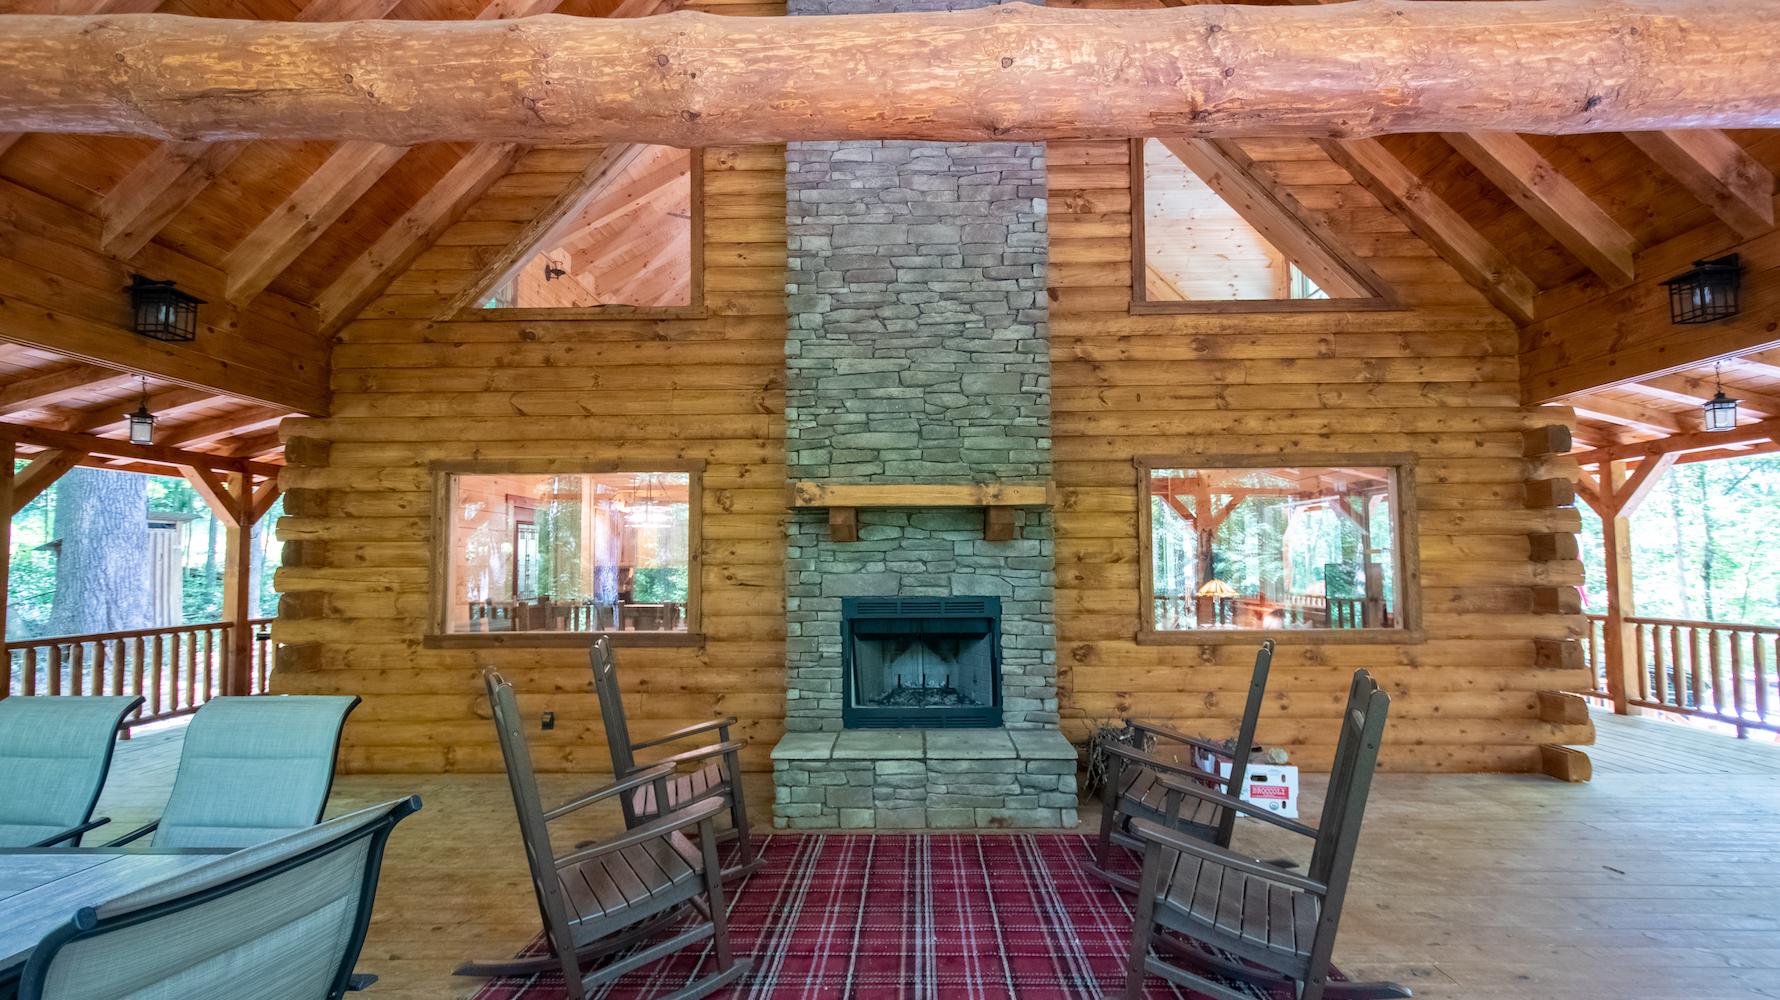 AHL outdoor fire place - AHL outdoor fire place